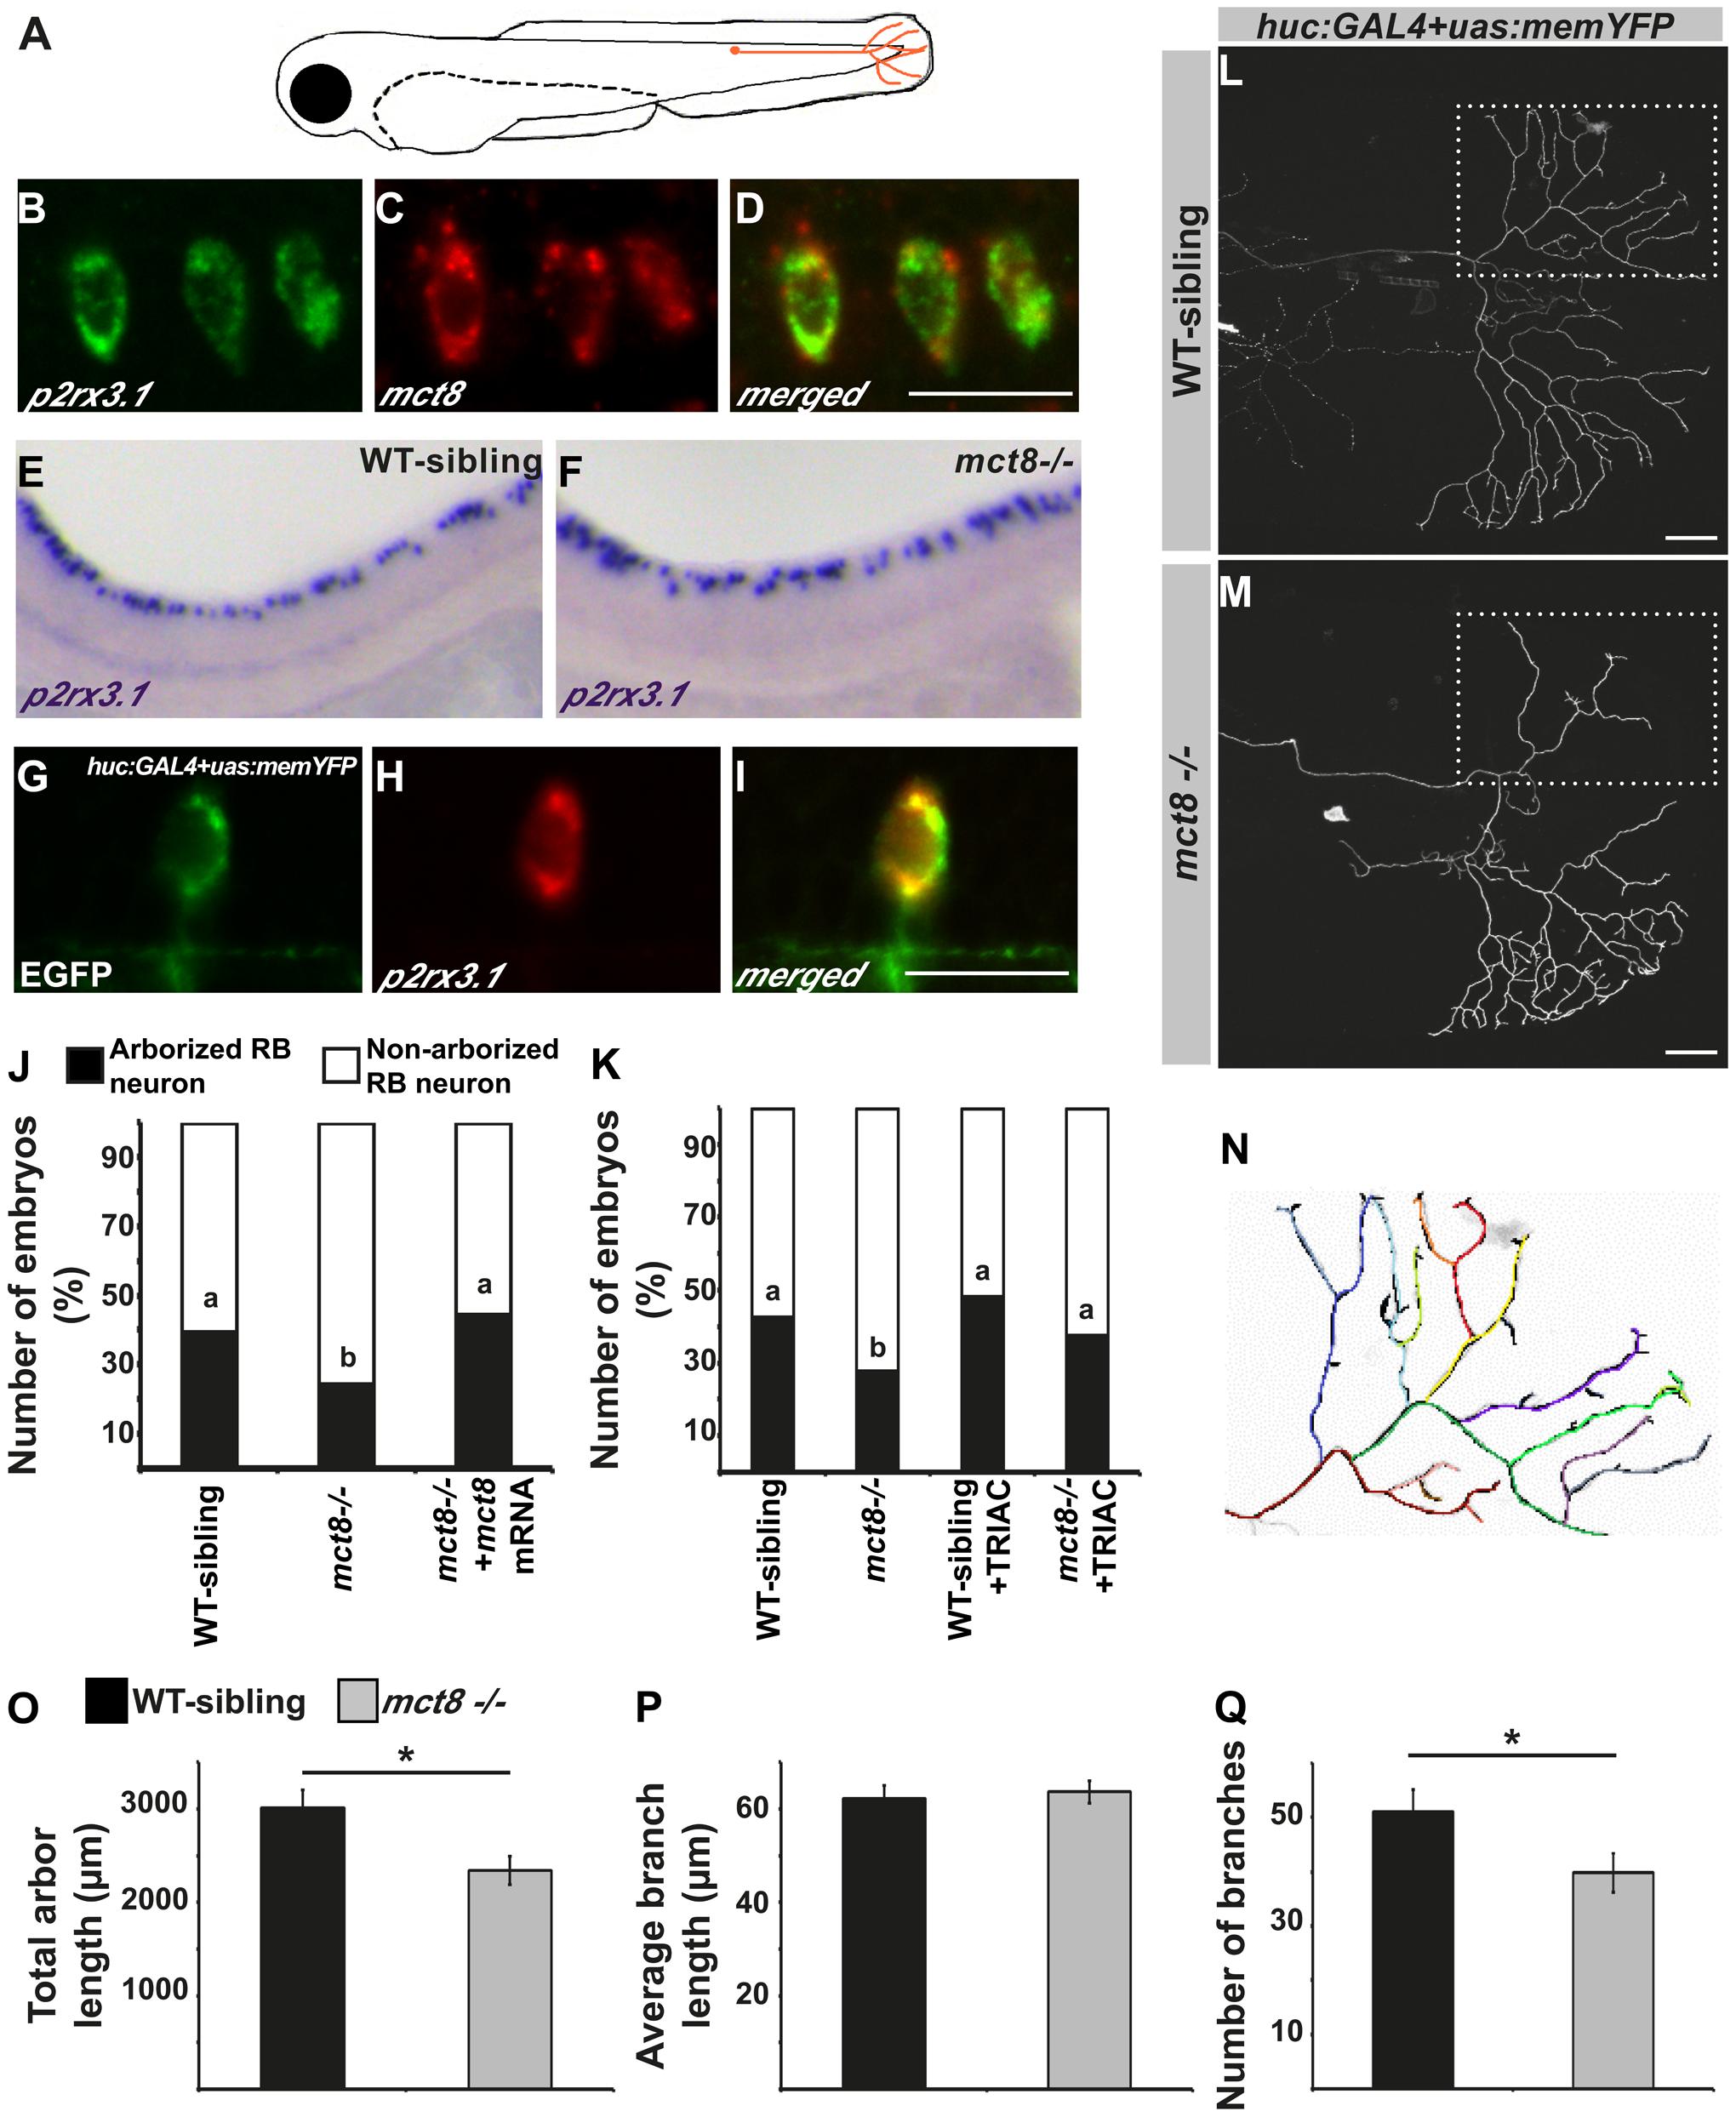 MCT8 regulates axon branching in the Rohon-Beard sensory neurons.